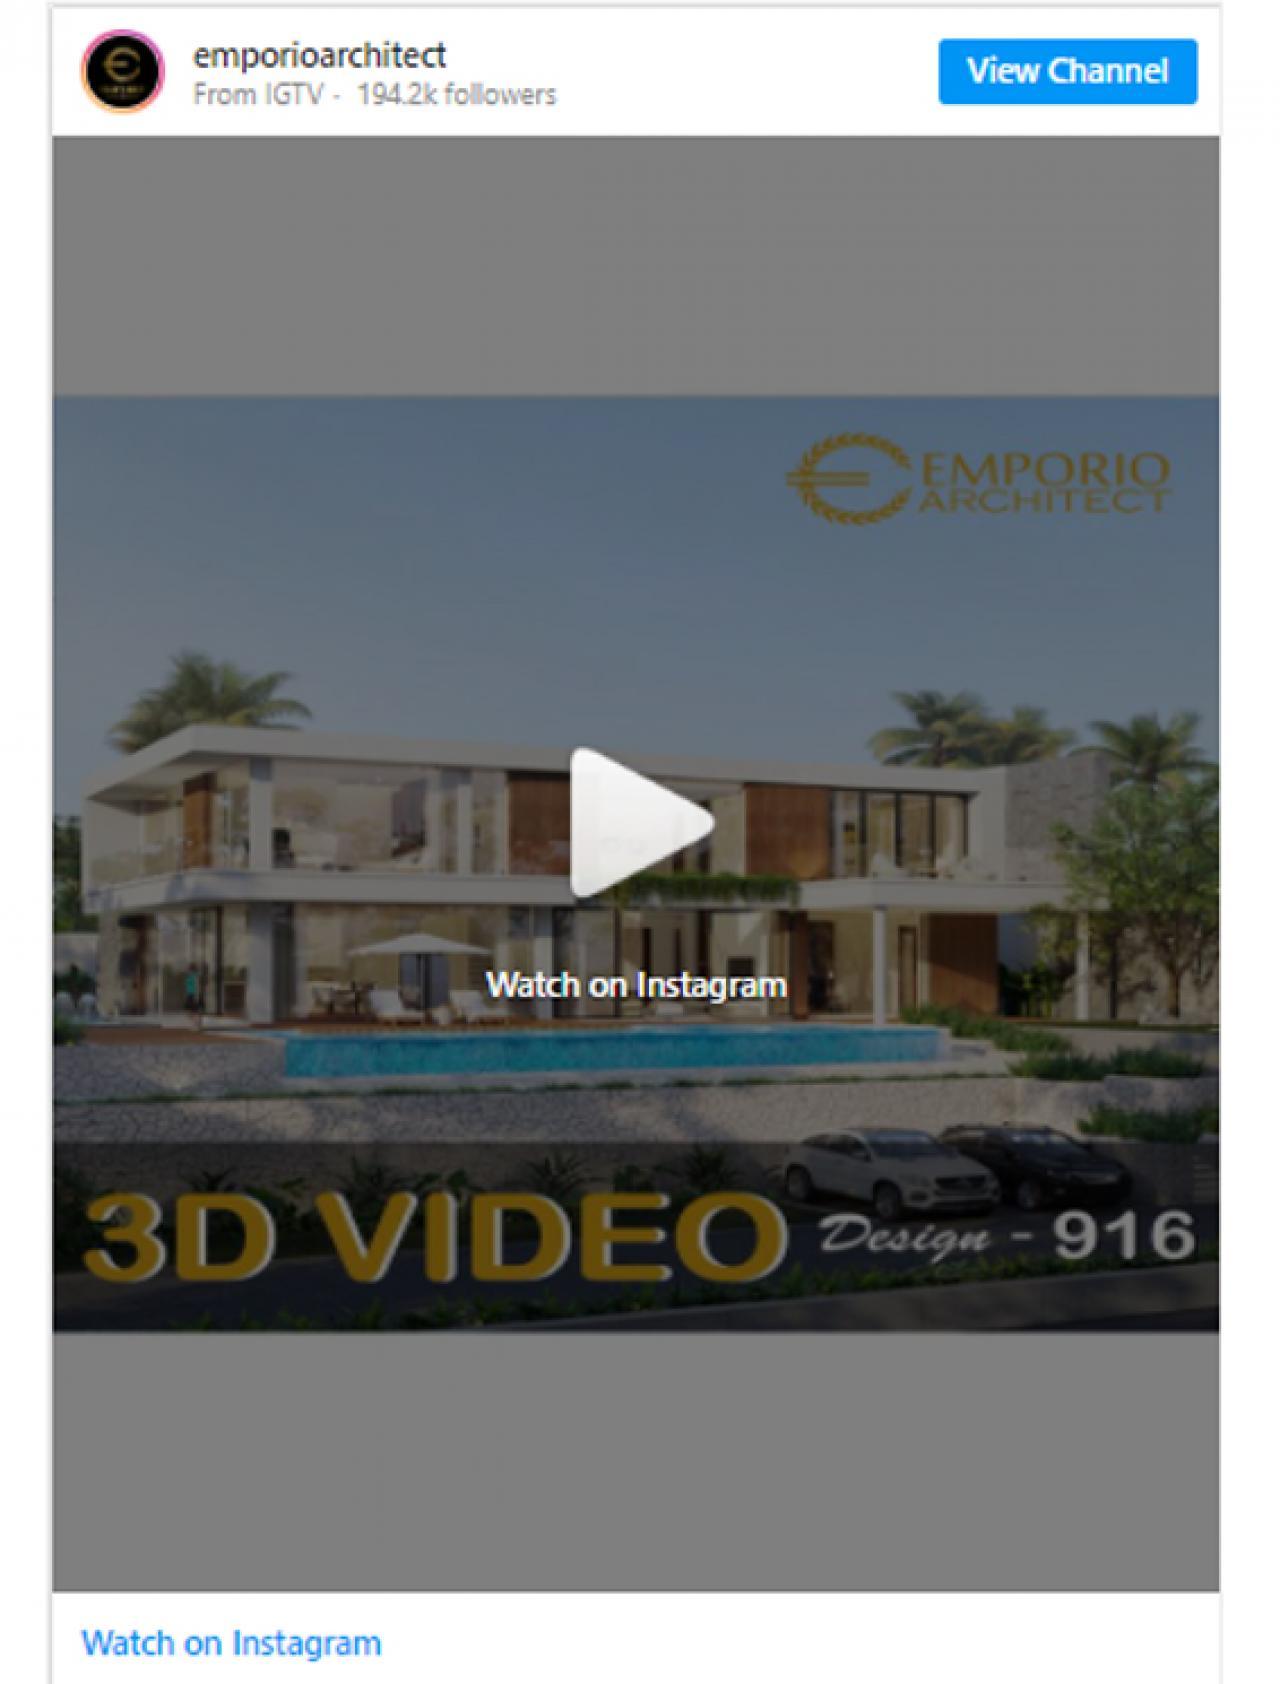 Ulasan Media TribunJakarta.com - Wujudkan Hunian Impian Bersama Emporio Architect, Karya Anak Bangsa yang Sukses Tembus Internasional 3 3